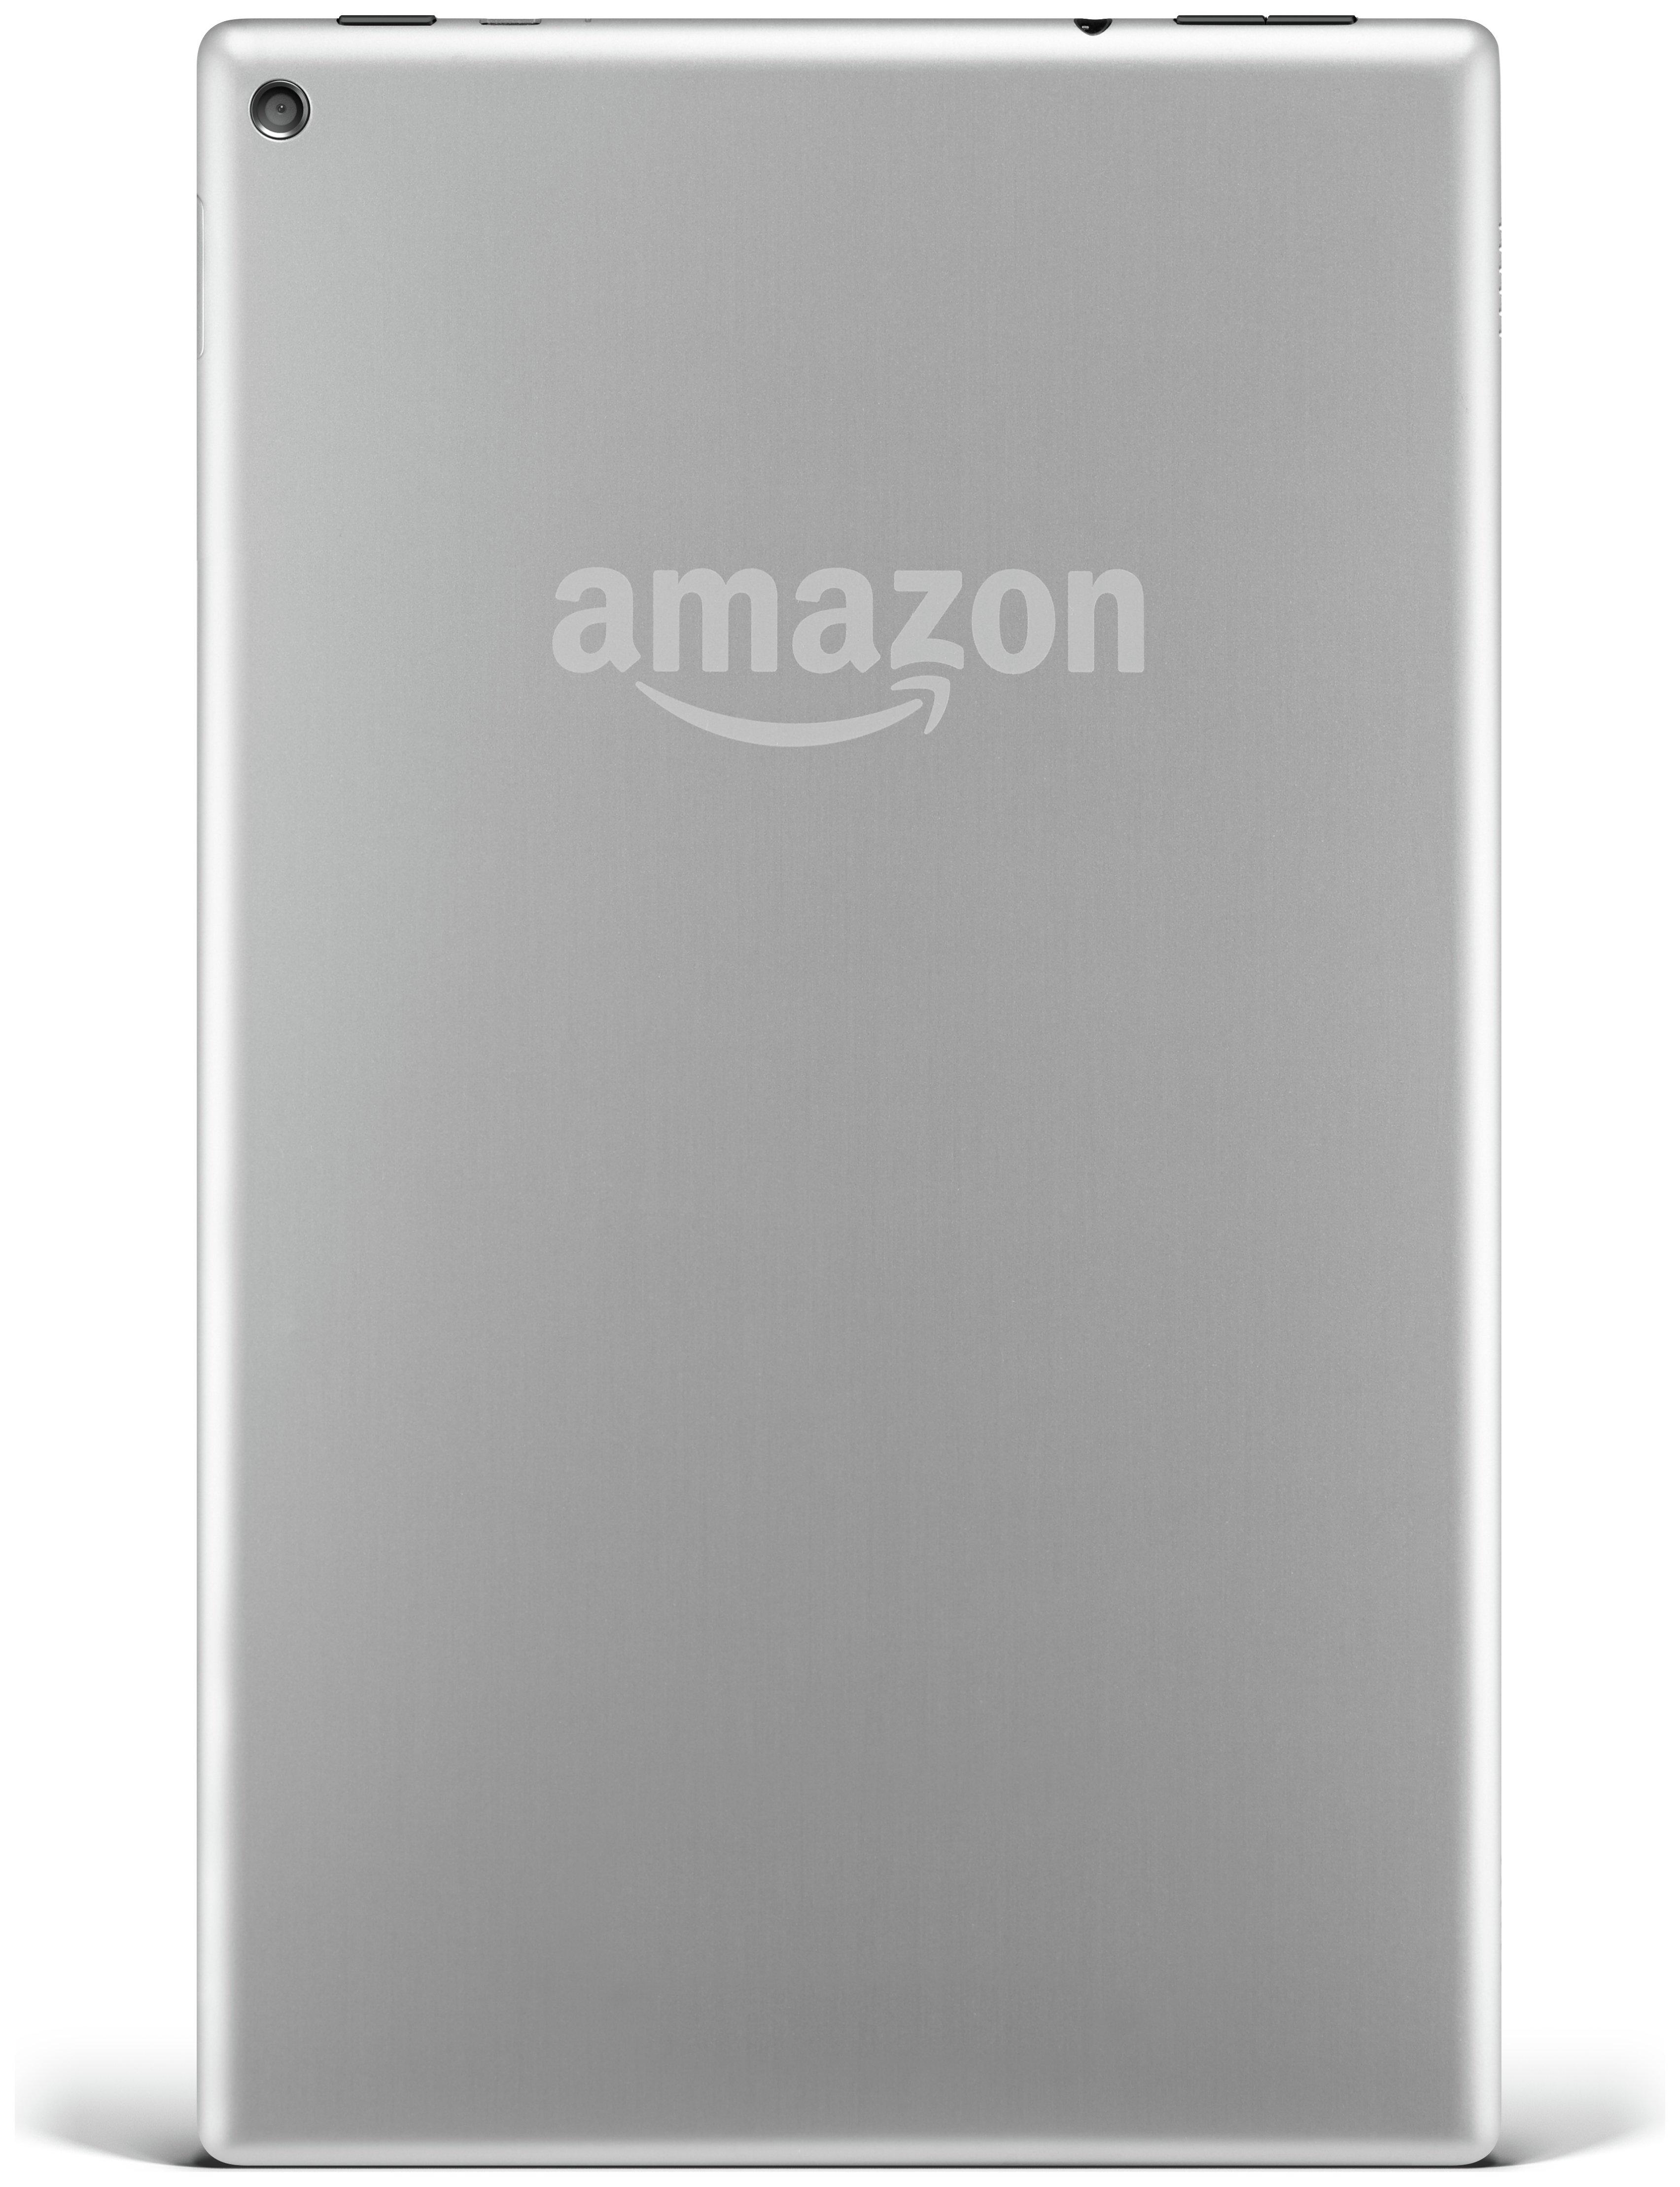 Amazon Fire Amazon Fire HD 10  10.1 Inch 16GB Tablet - Silver.